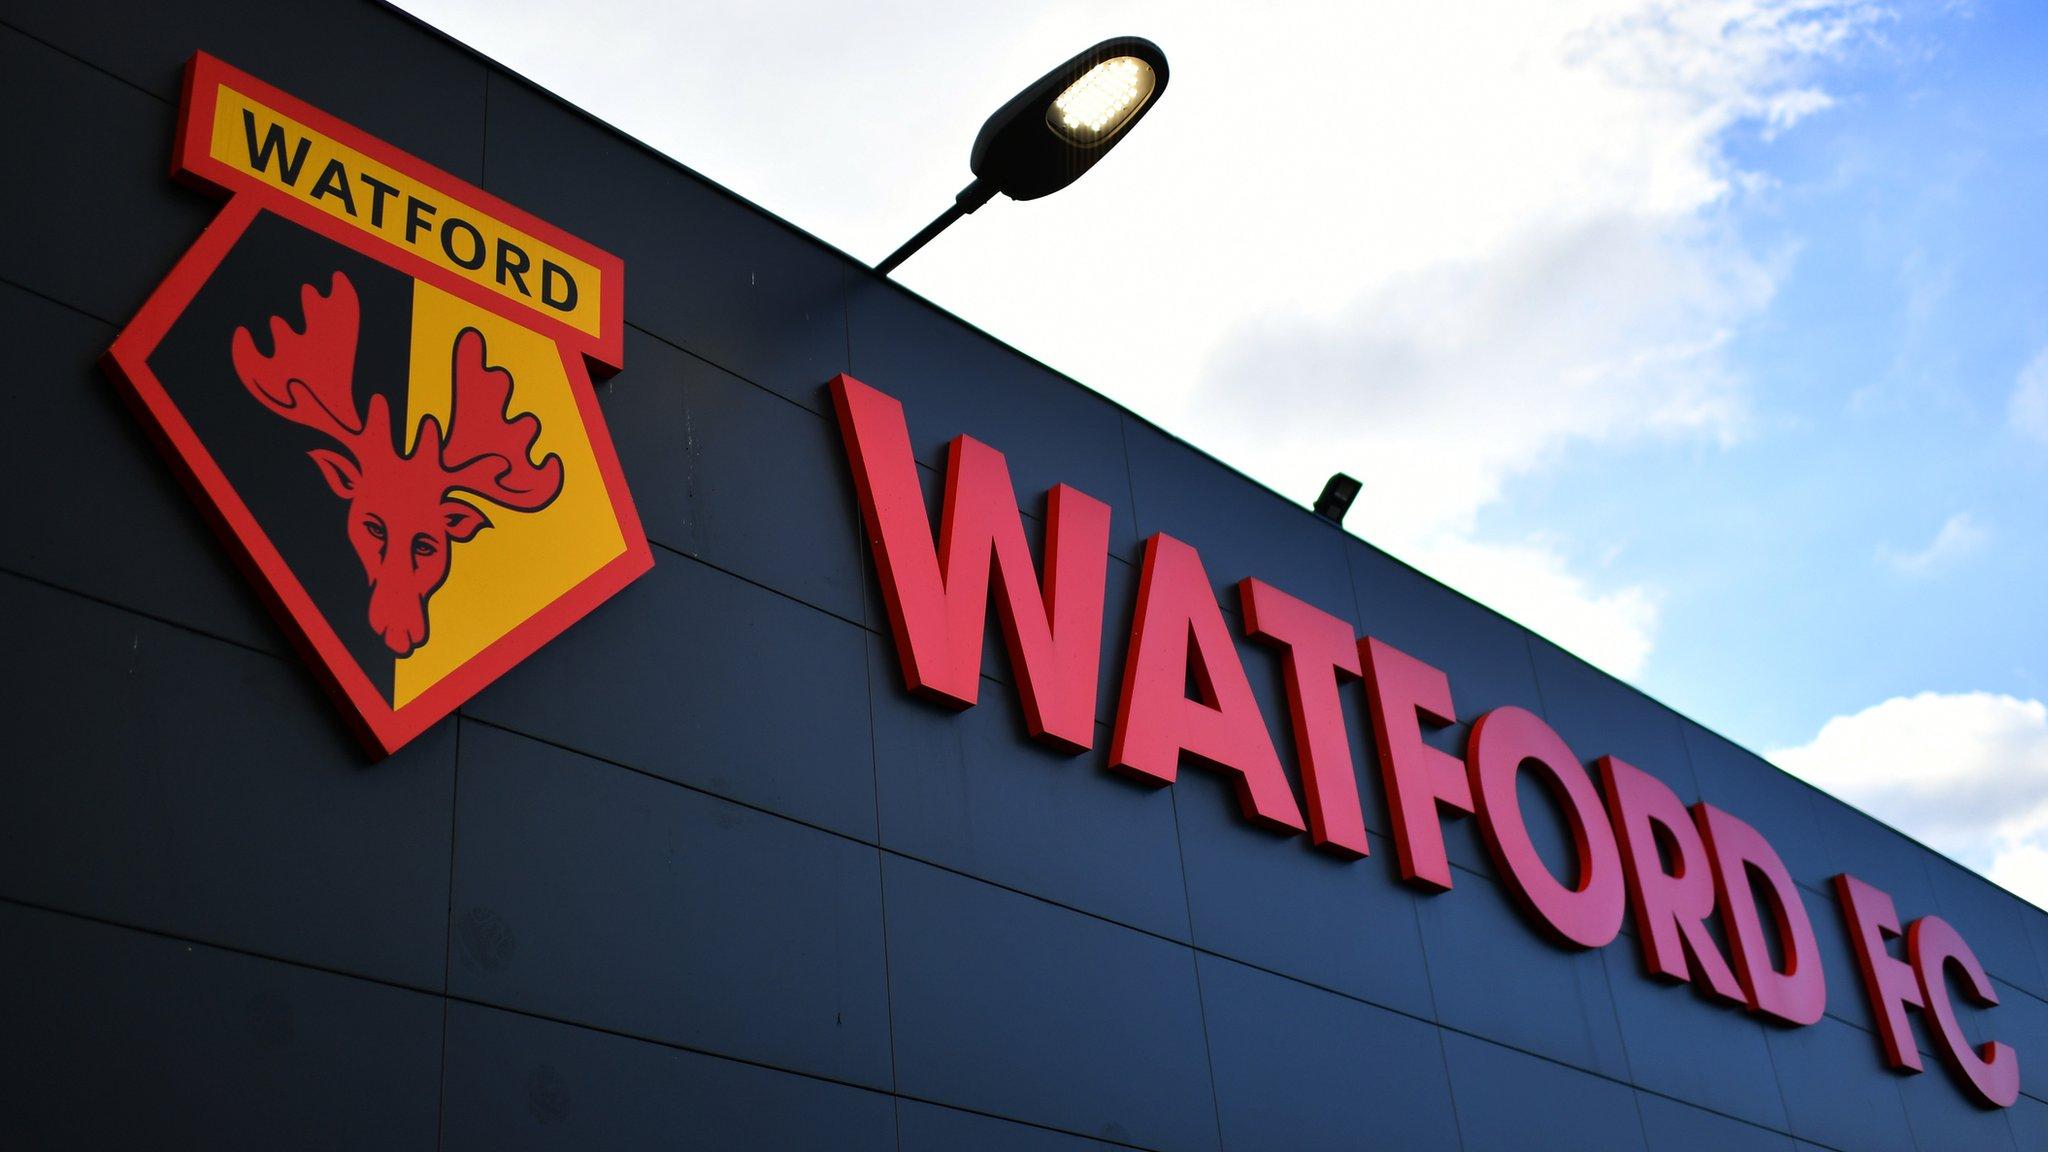 Raffaele Riva: Ex-Watford chairman given indefinite English football ban